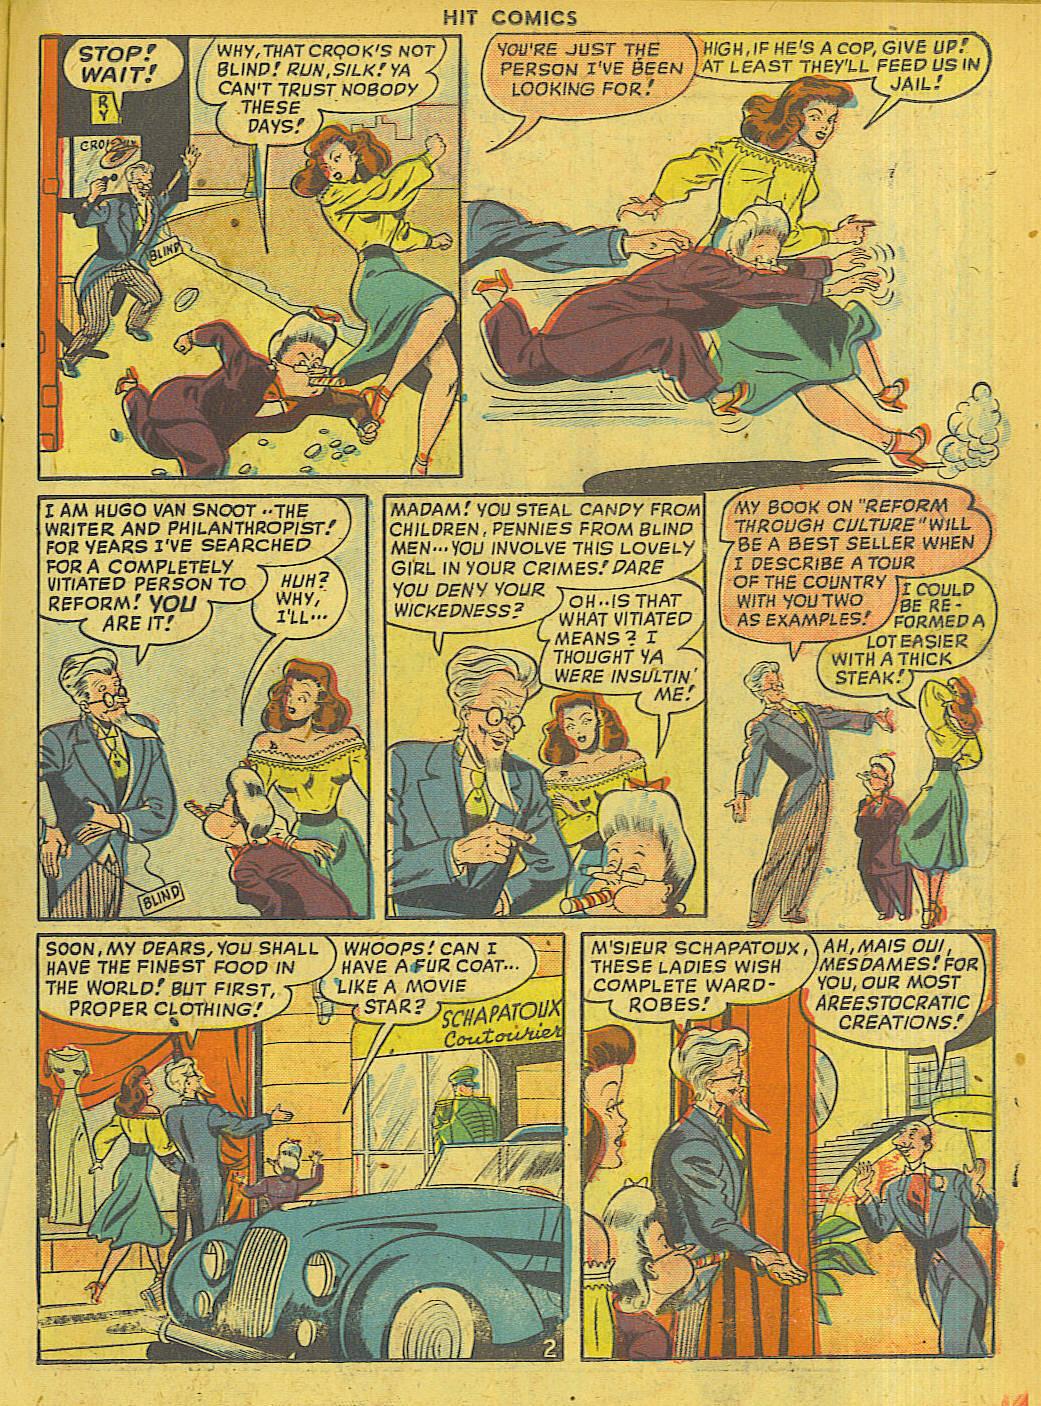 Read online Hit Comics comic -  Issue #56 - 17